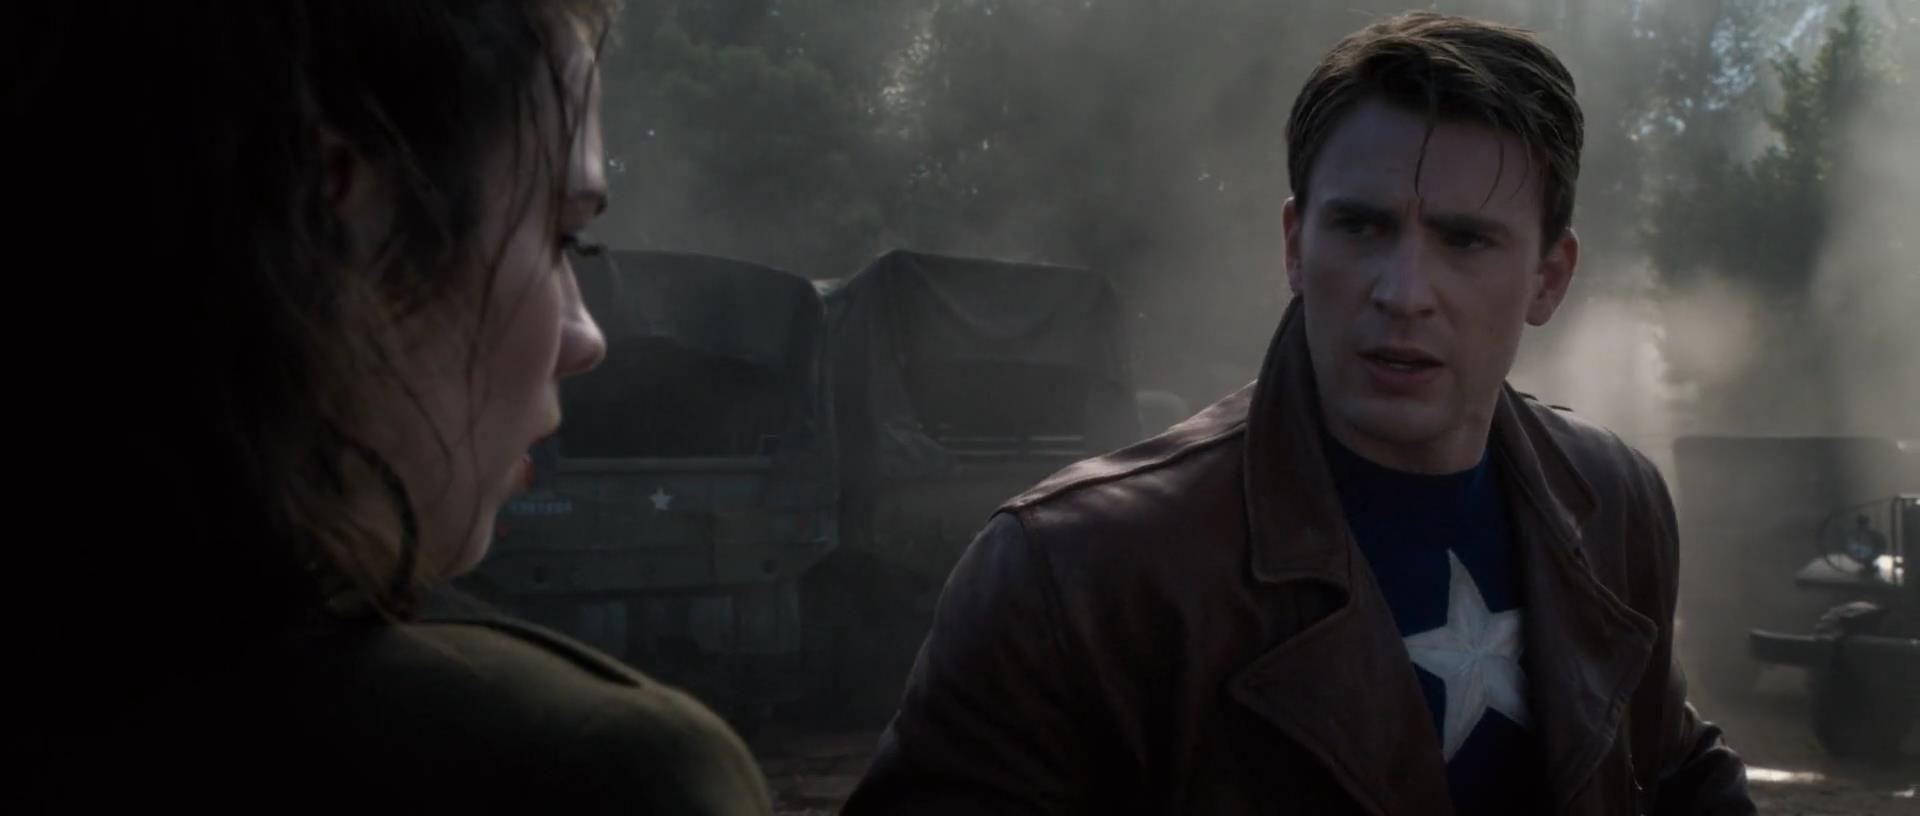 Captain America The First Avenger 2011 Movie Screencaps